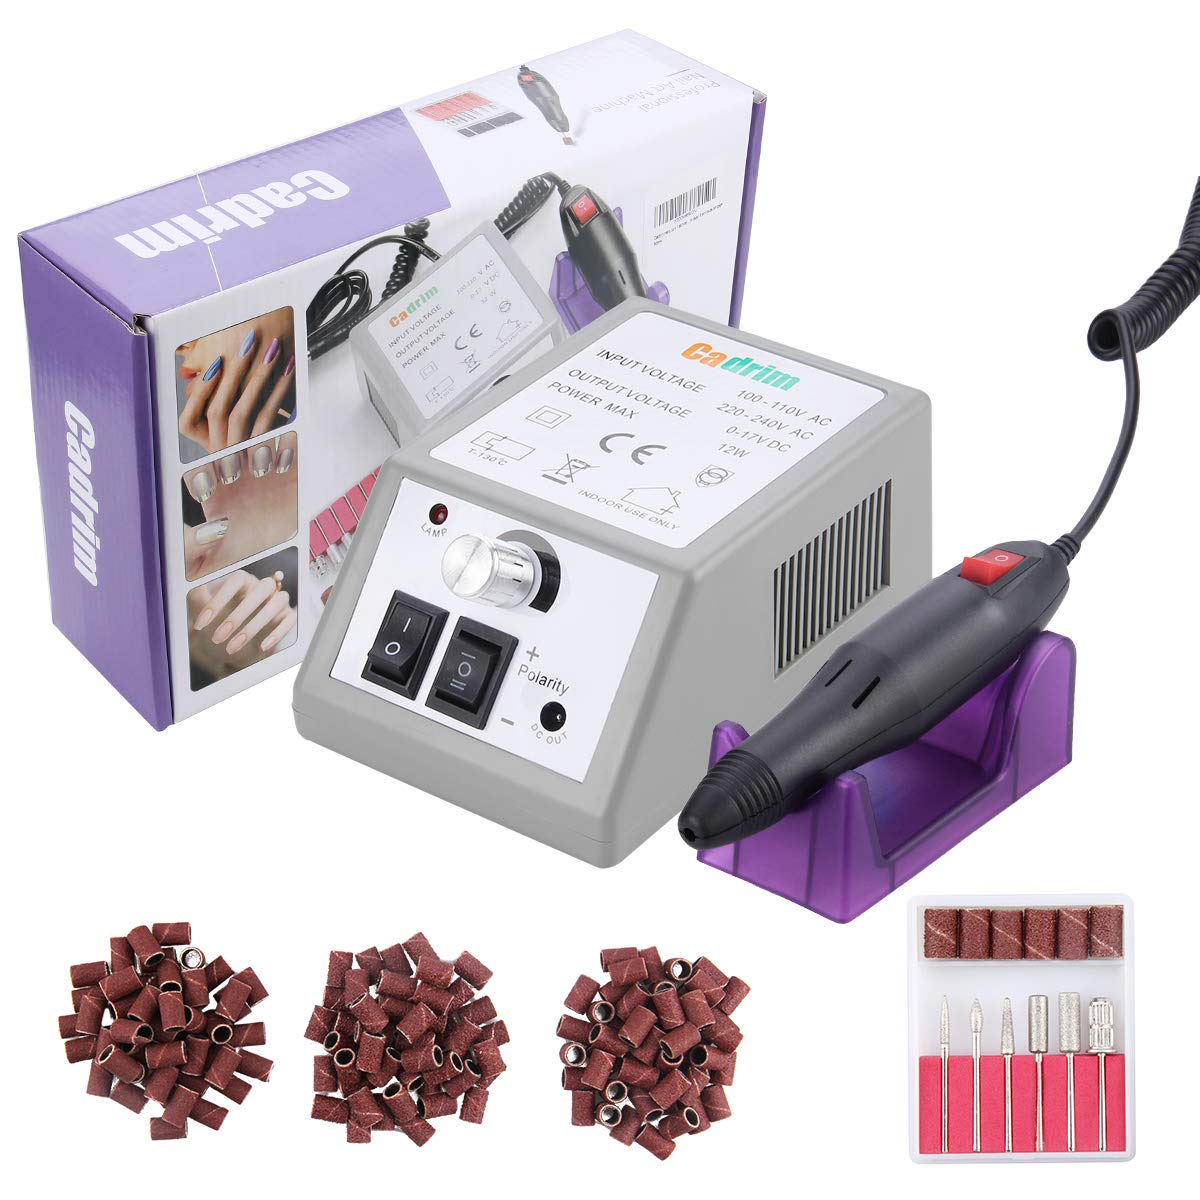 Electric Nail Drill Cadrim Nail Drill Machine Nail File Drill Set Kit for Acrylic Nails Gel Nail Glazing Nail Drill Nail Art Polisher Sets Glazing Nail Drill Fast Manicure Pedicure (White)